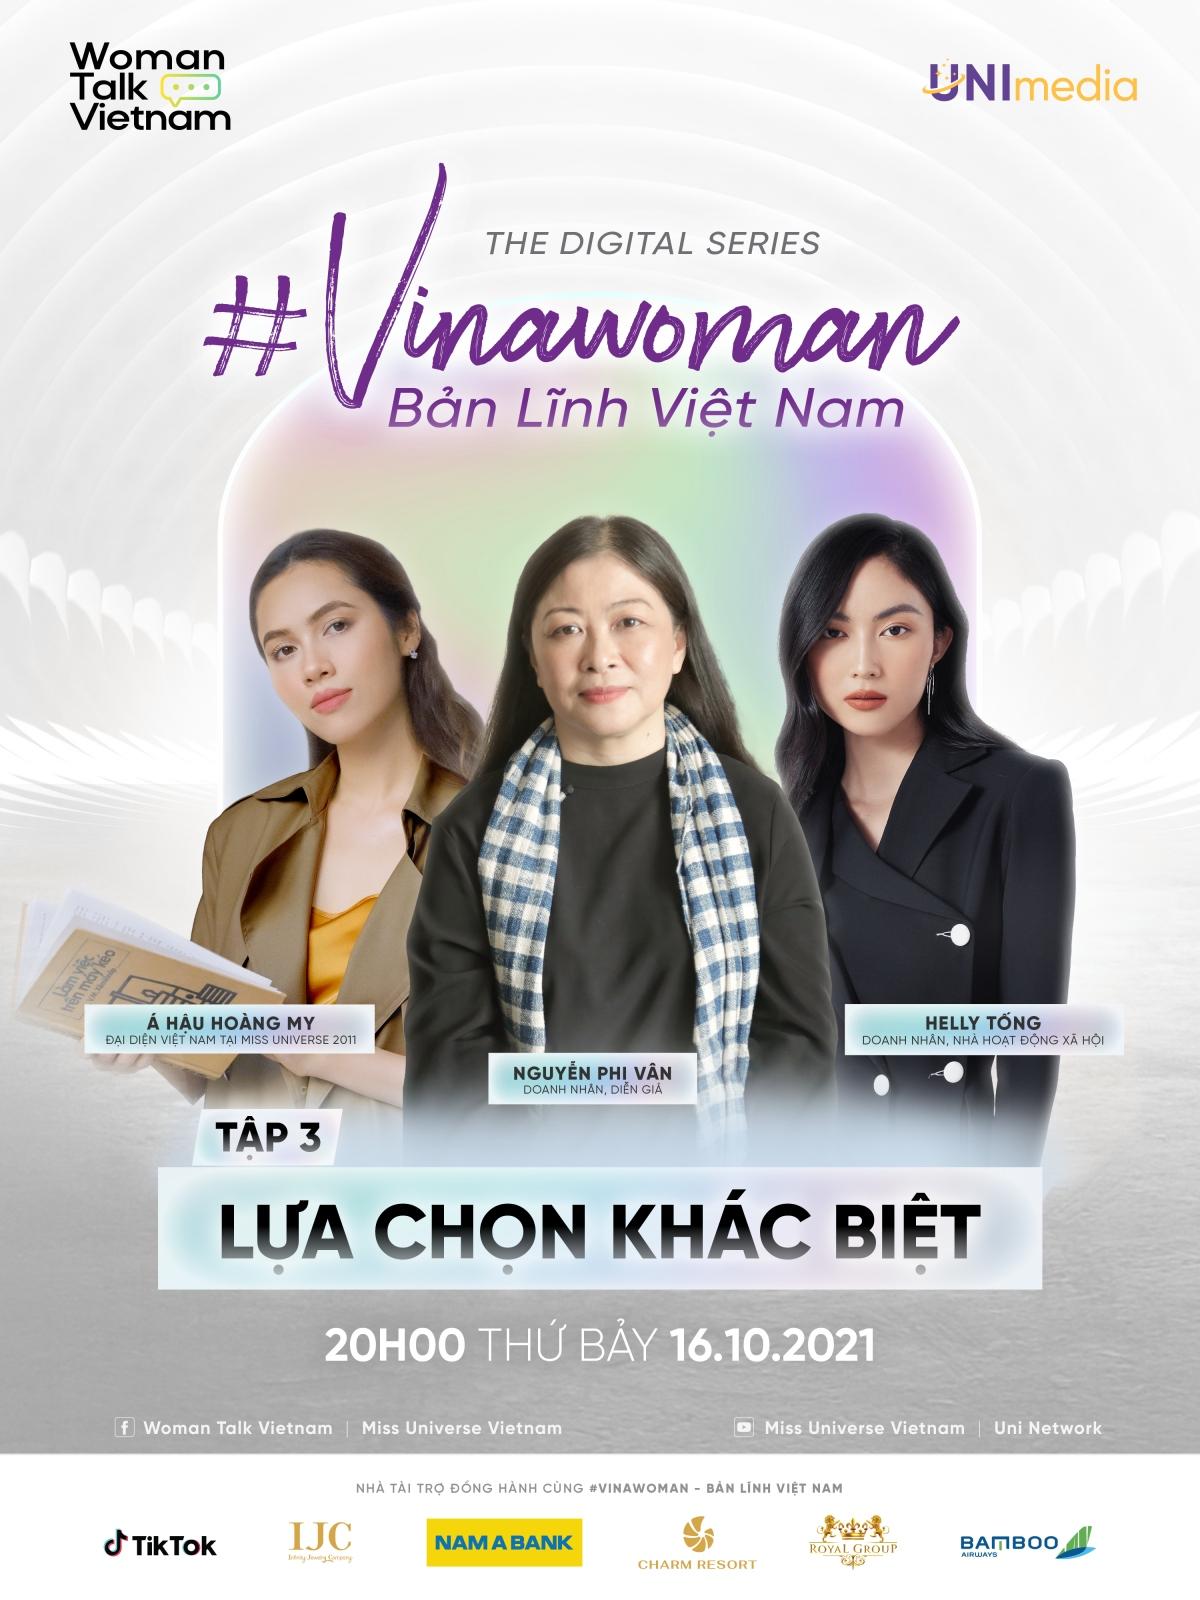 poster_tap_3_lua_chon_khac_biet.png